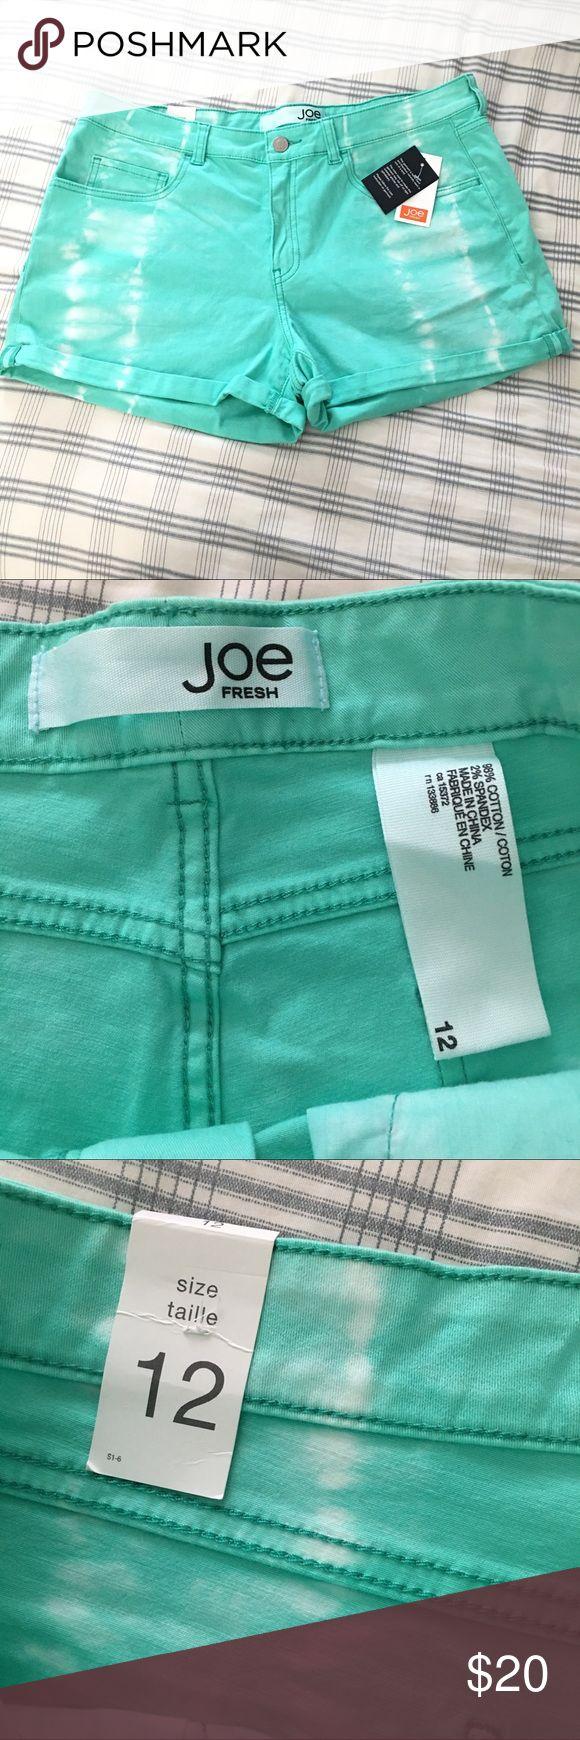 NWT JOE FRESH AQUA SHORTS, Sz 12 New, never used Joe Fresh Aqua shorts, Size 12. Pls. check all photos for details. Msg for any question. Joe Fresh Shorts